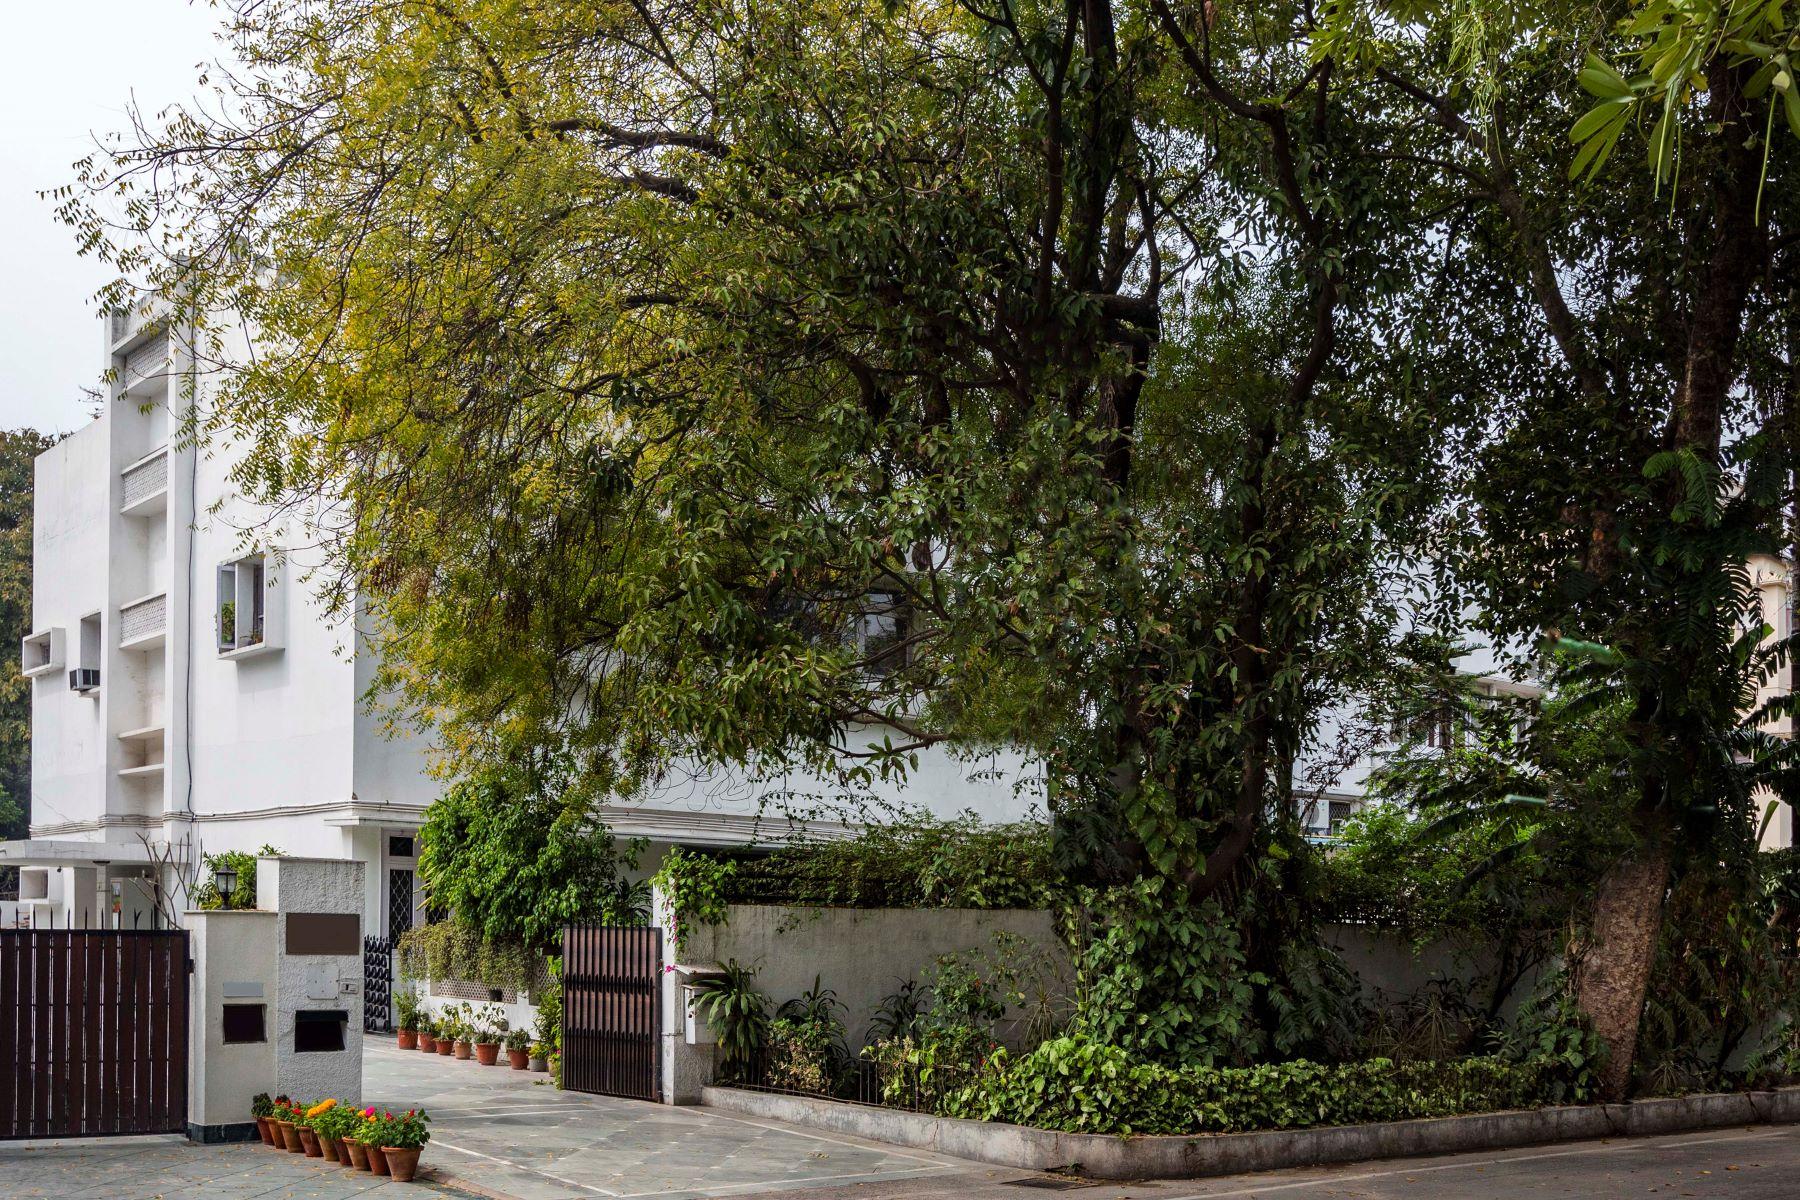 Single Family Homes for Sale at Bungalow in Sunder Nagar Sunder Nagar, Lutyens Bungalow Zone New Delhi, Delhi 110003 India